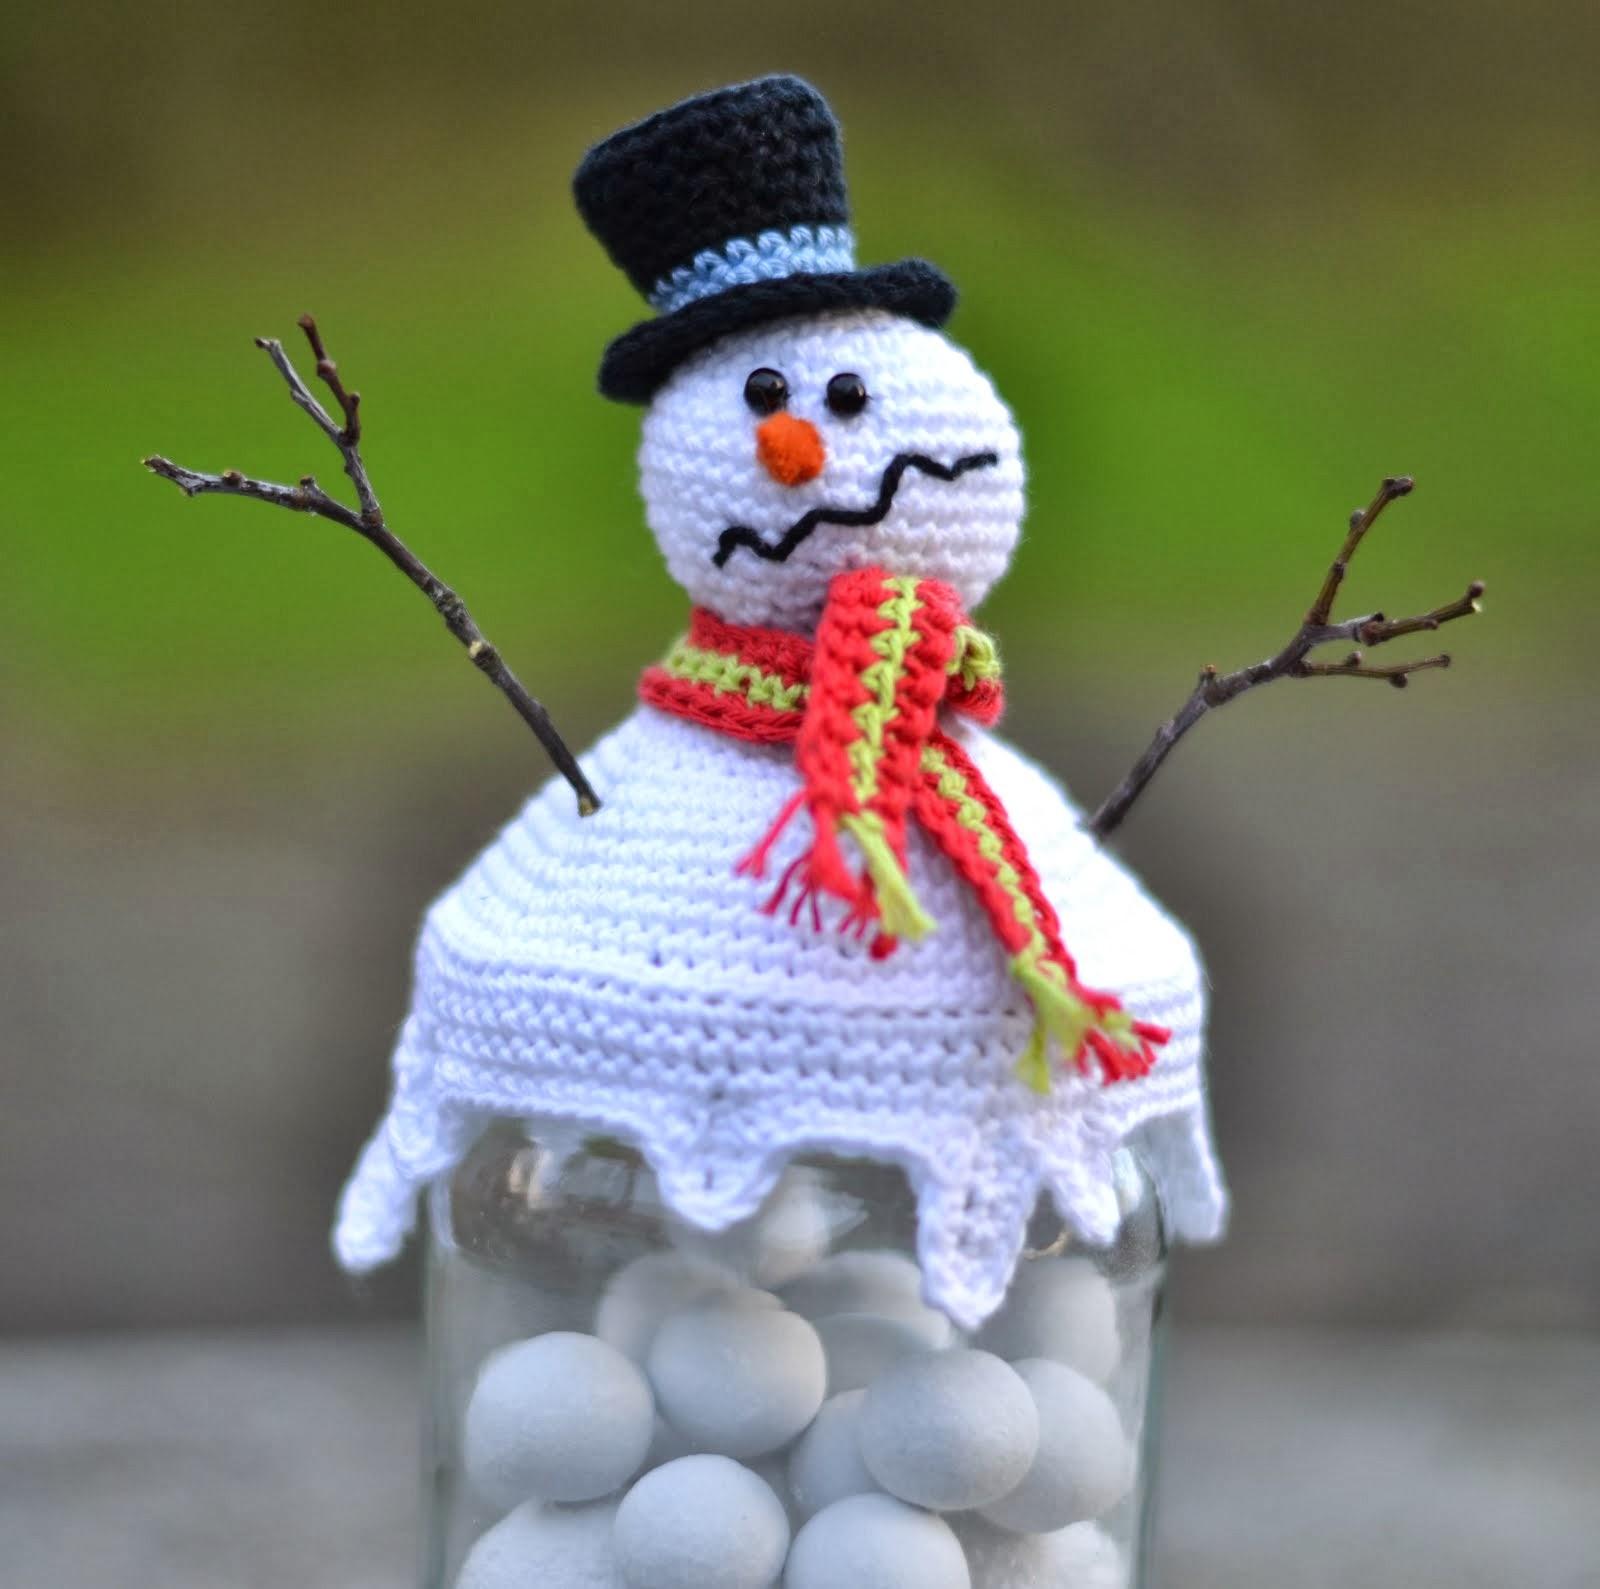 Hæklet snemand